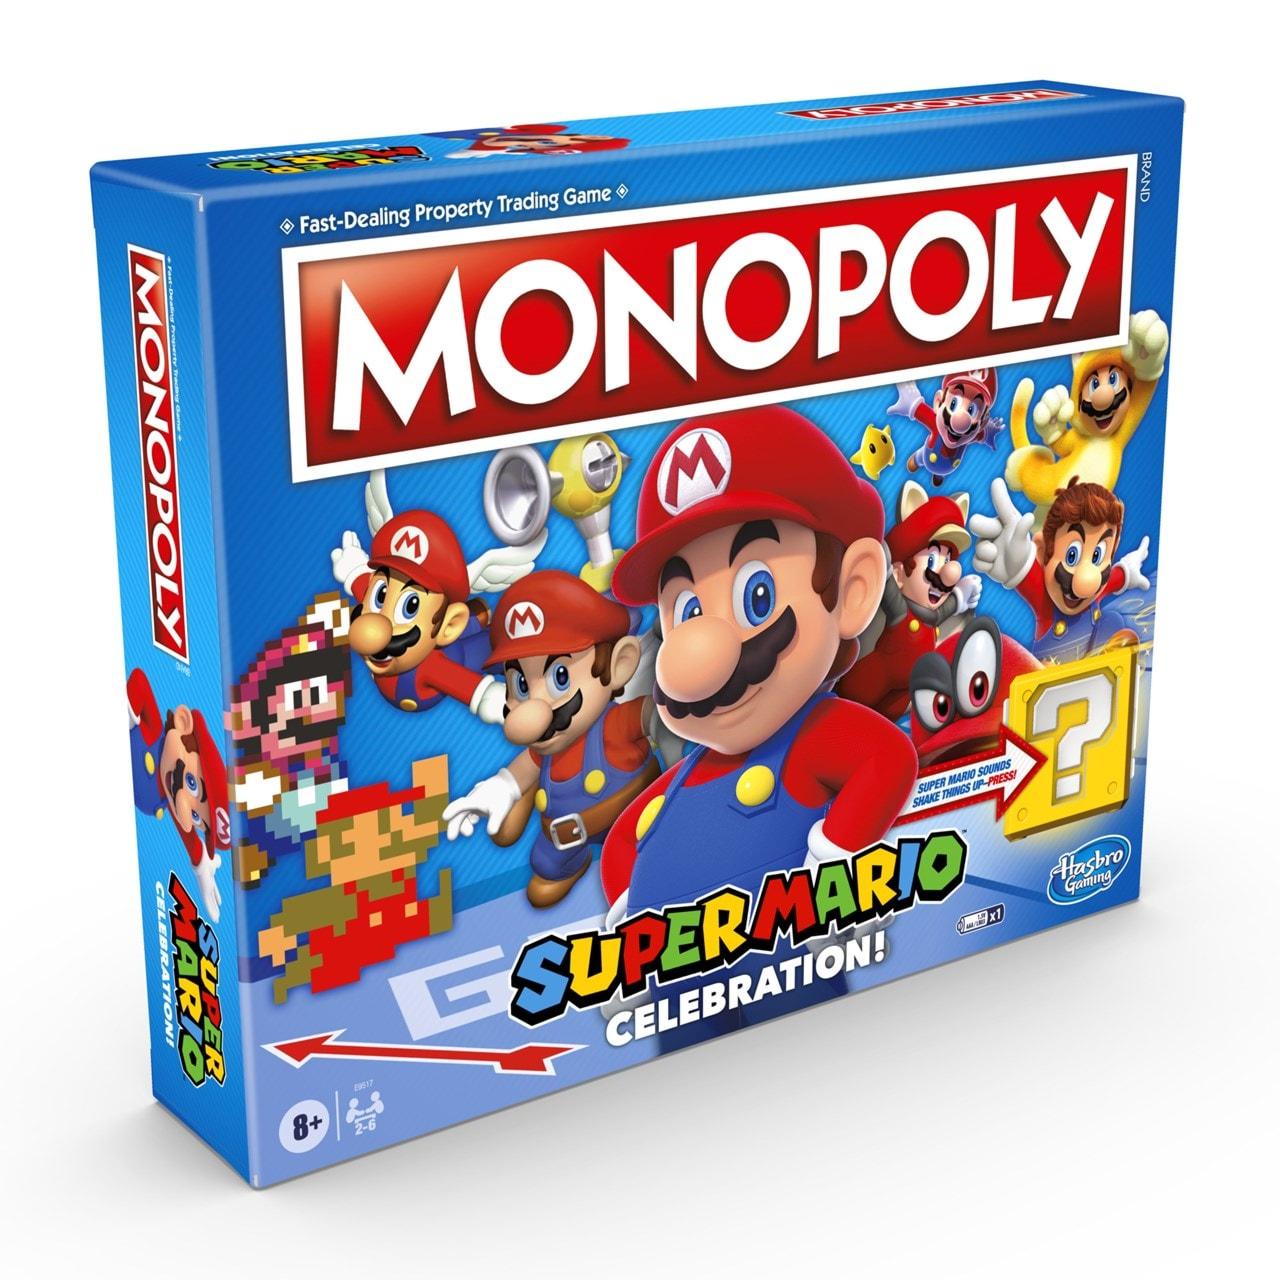 Monopoly: Super Mario Celebration - 4